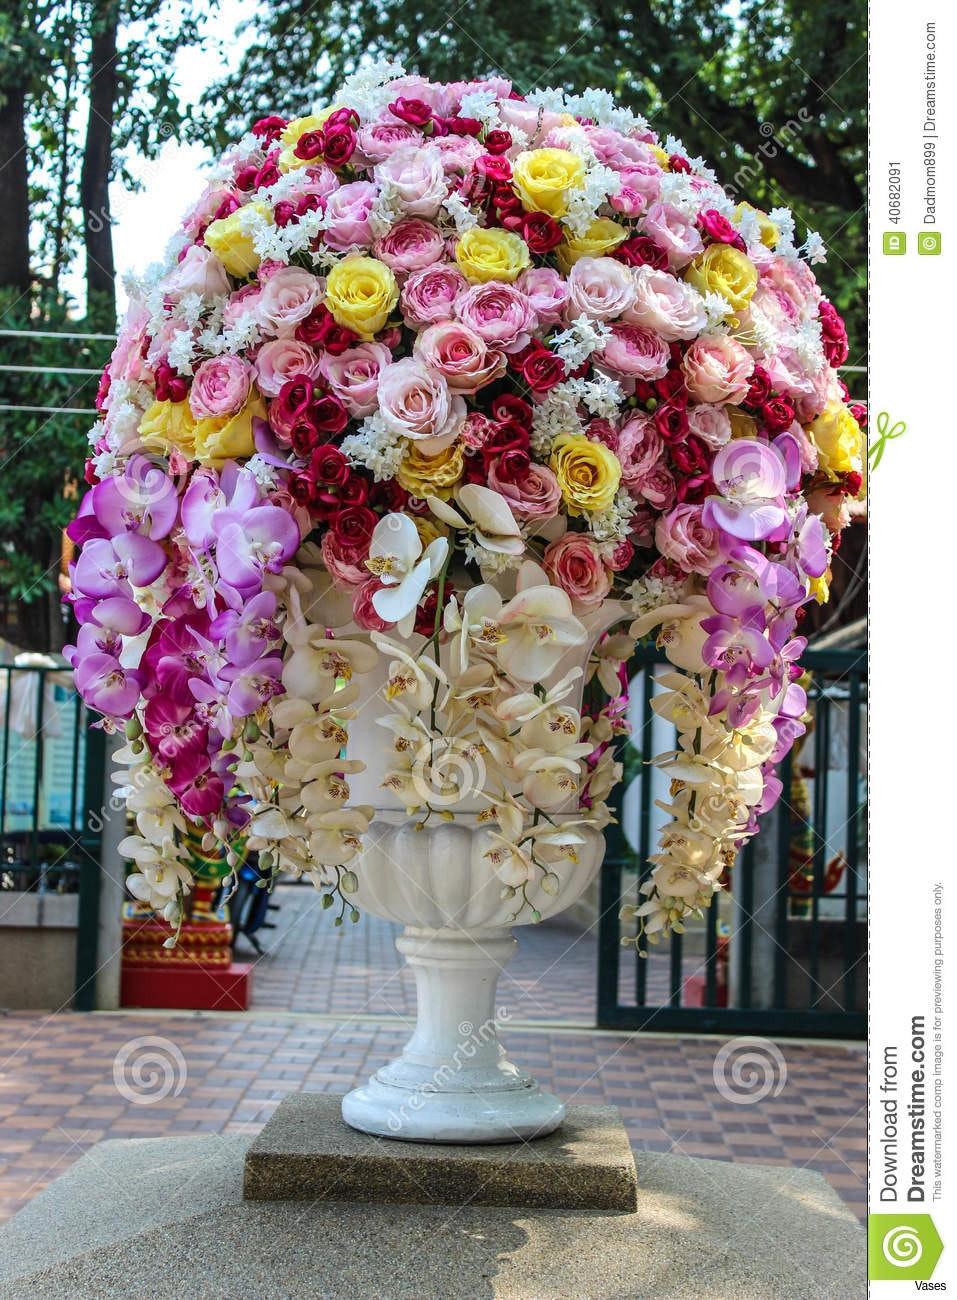 flowers in vase decor of floor vase decor elegant living room white floor vase luxury h vases with floor vase decor luxury vases flower floor vase with flowersi 0d outdoor arrangements scheme of floor